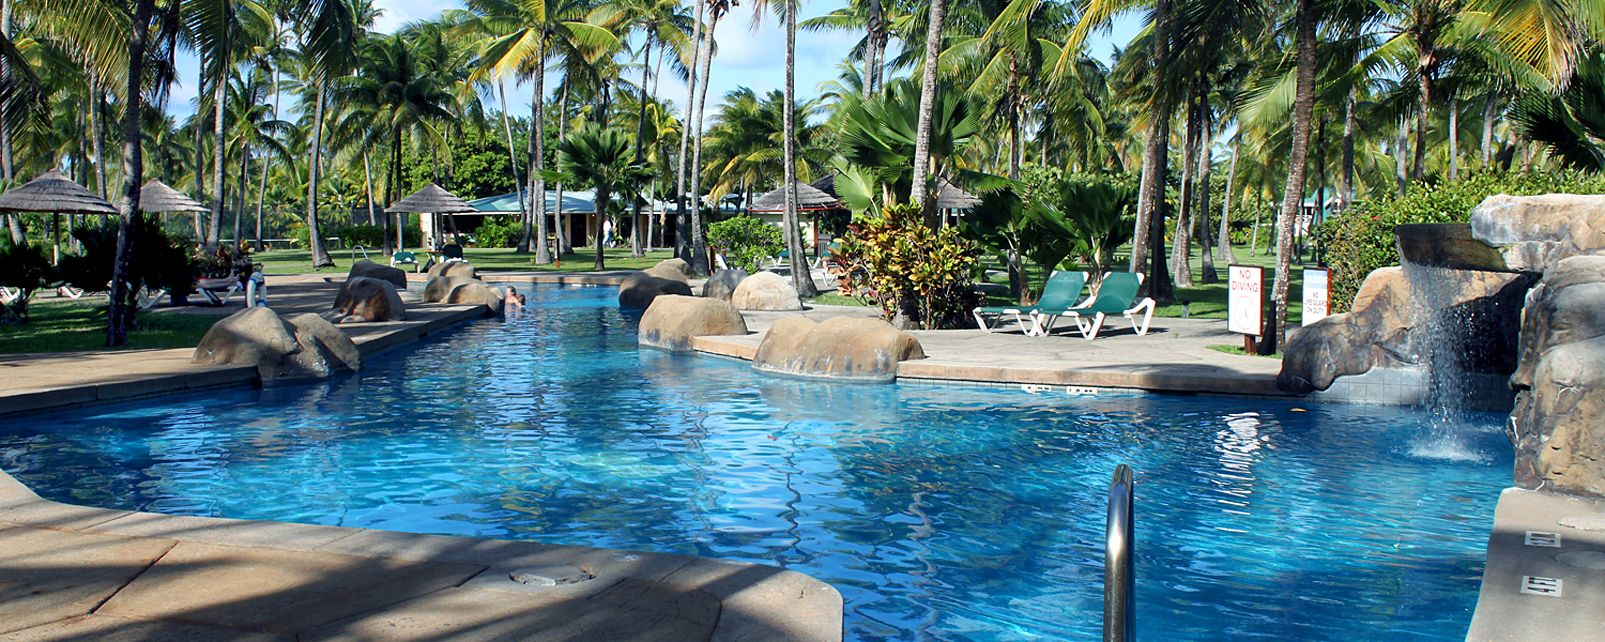 Hotel Palm Island Resort